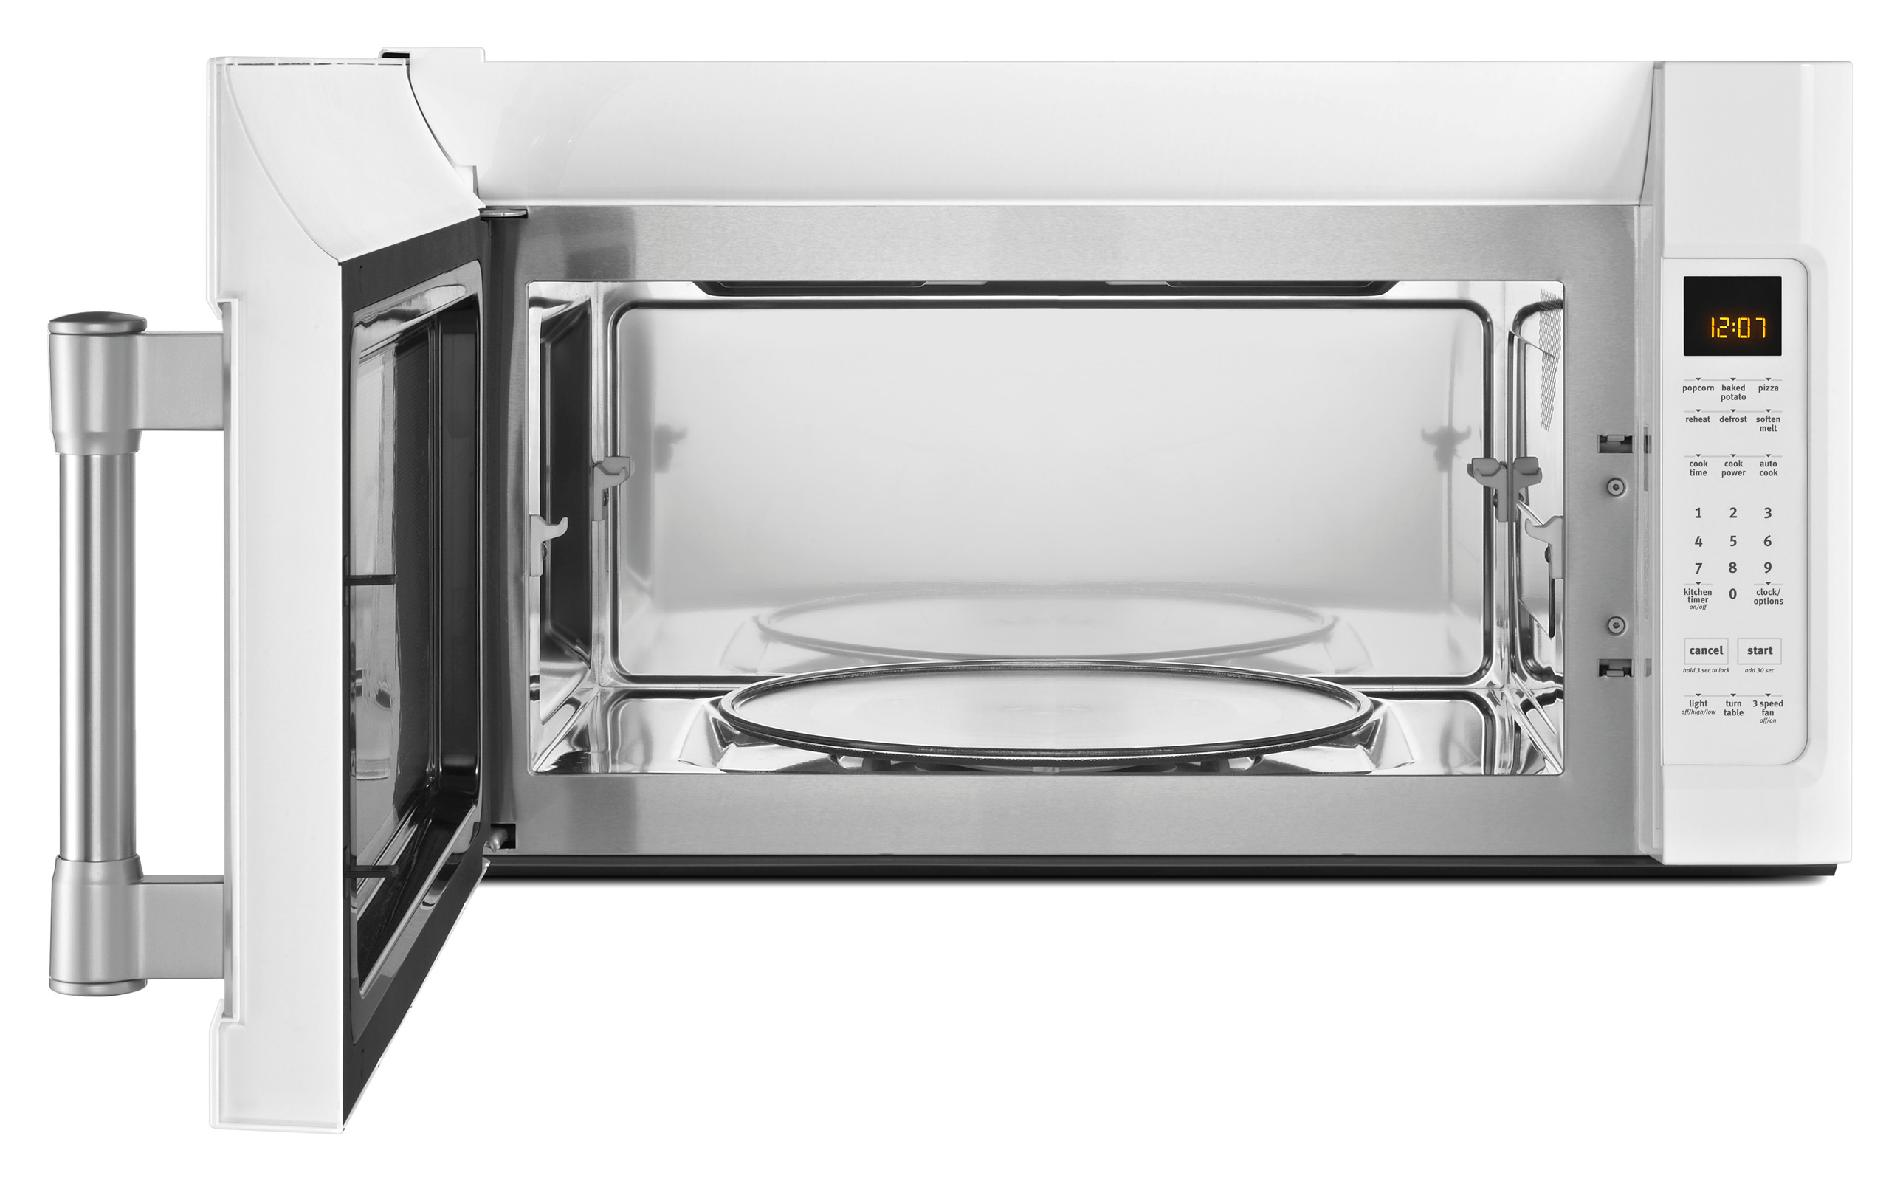 maytag mmv4205dh 2 0 cu ft microwave